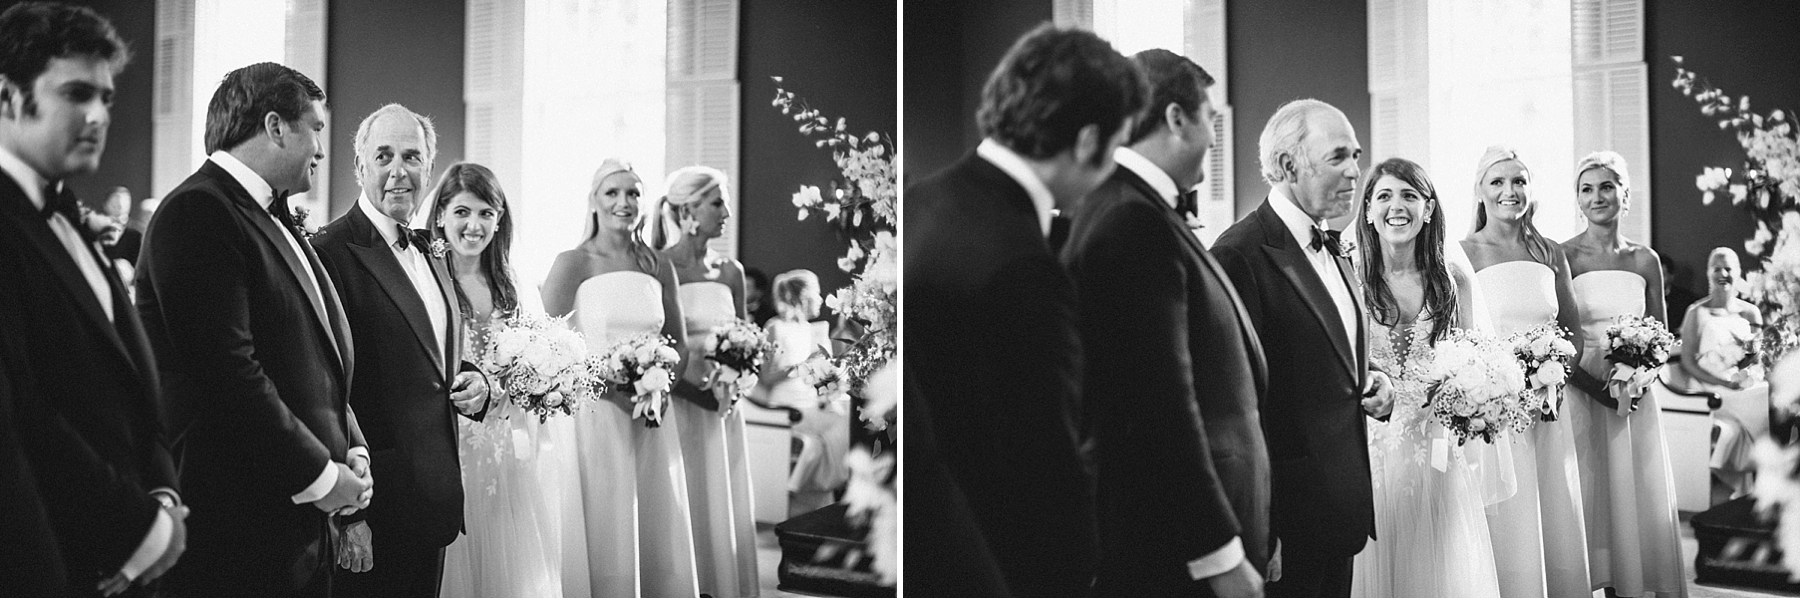 mashomack-preserve-polo-club-wedding-ny-photographer_0040.jpg